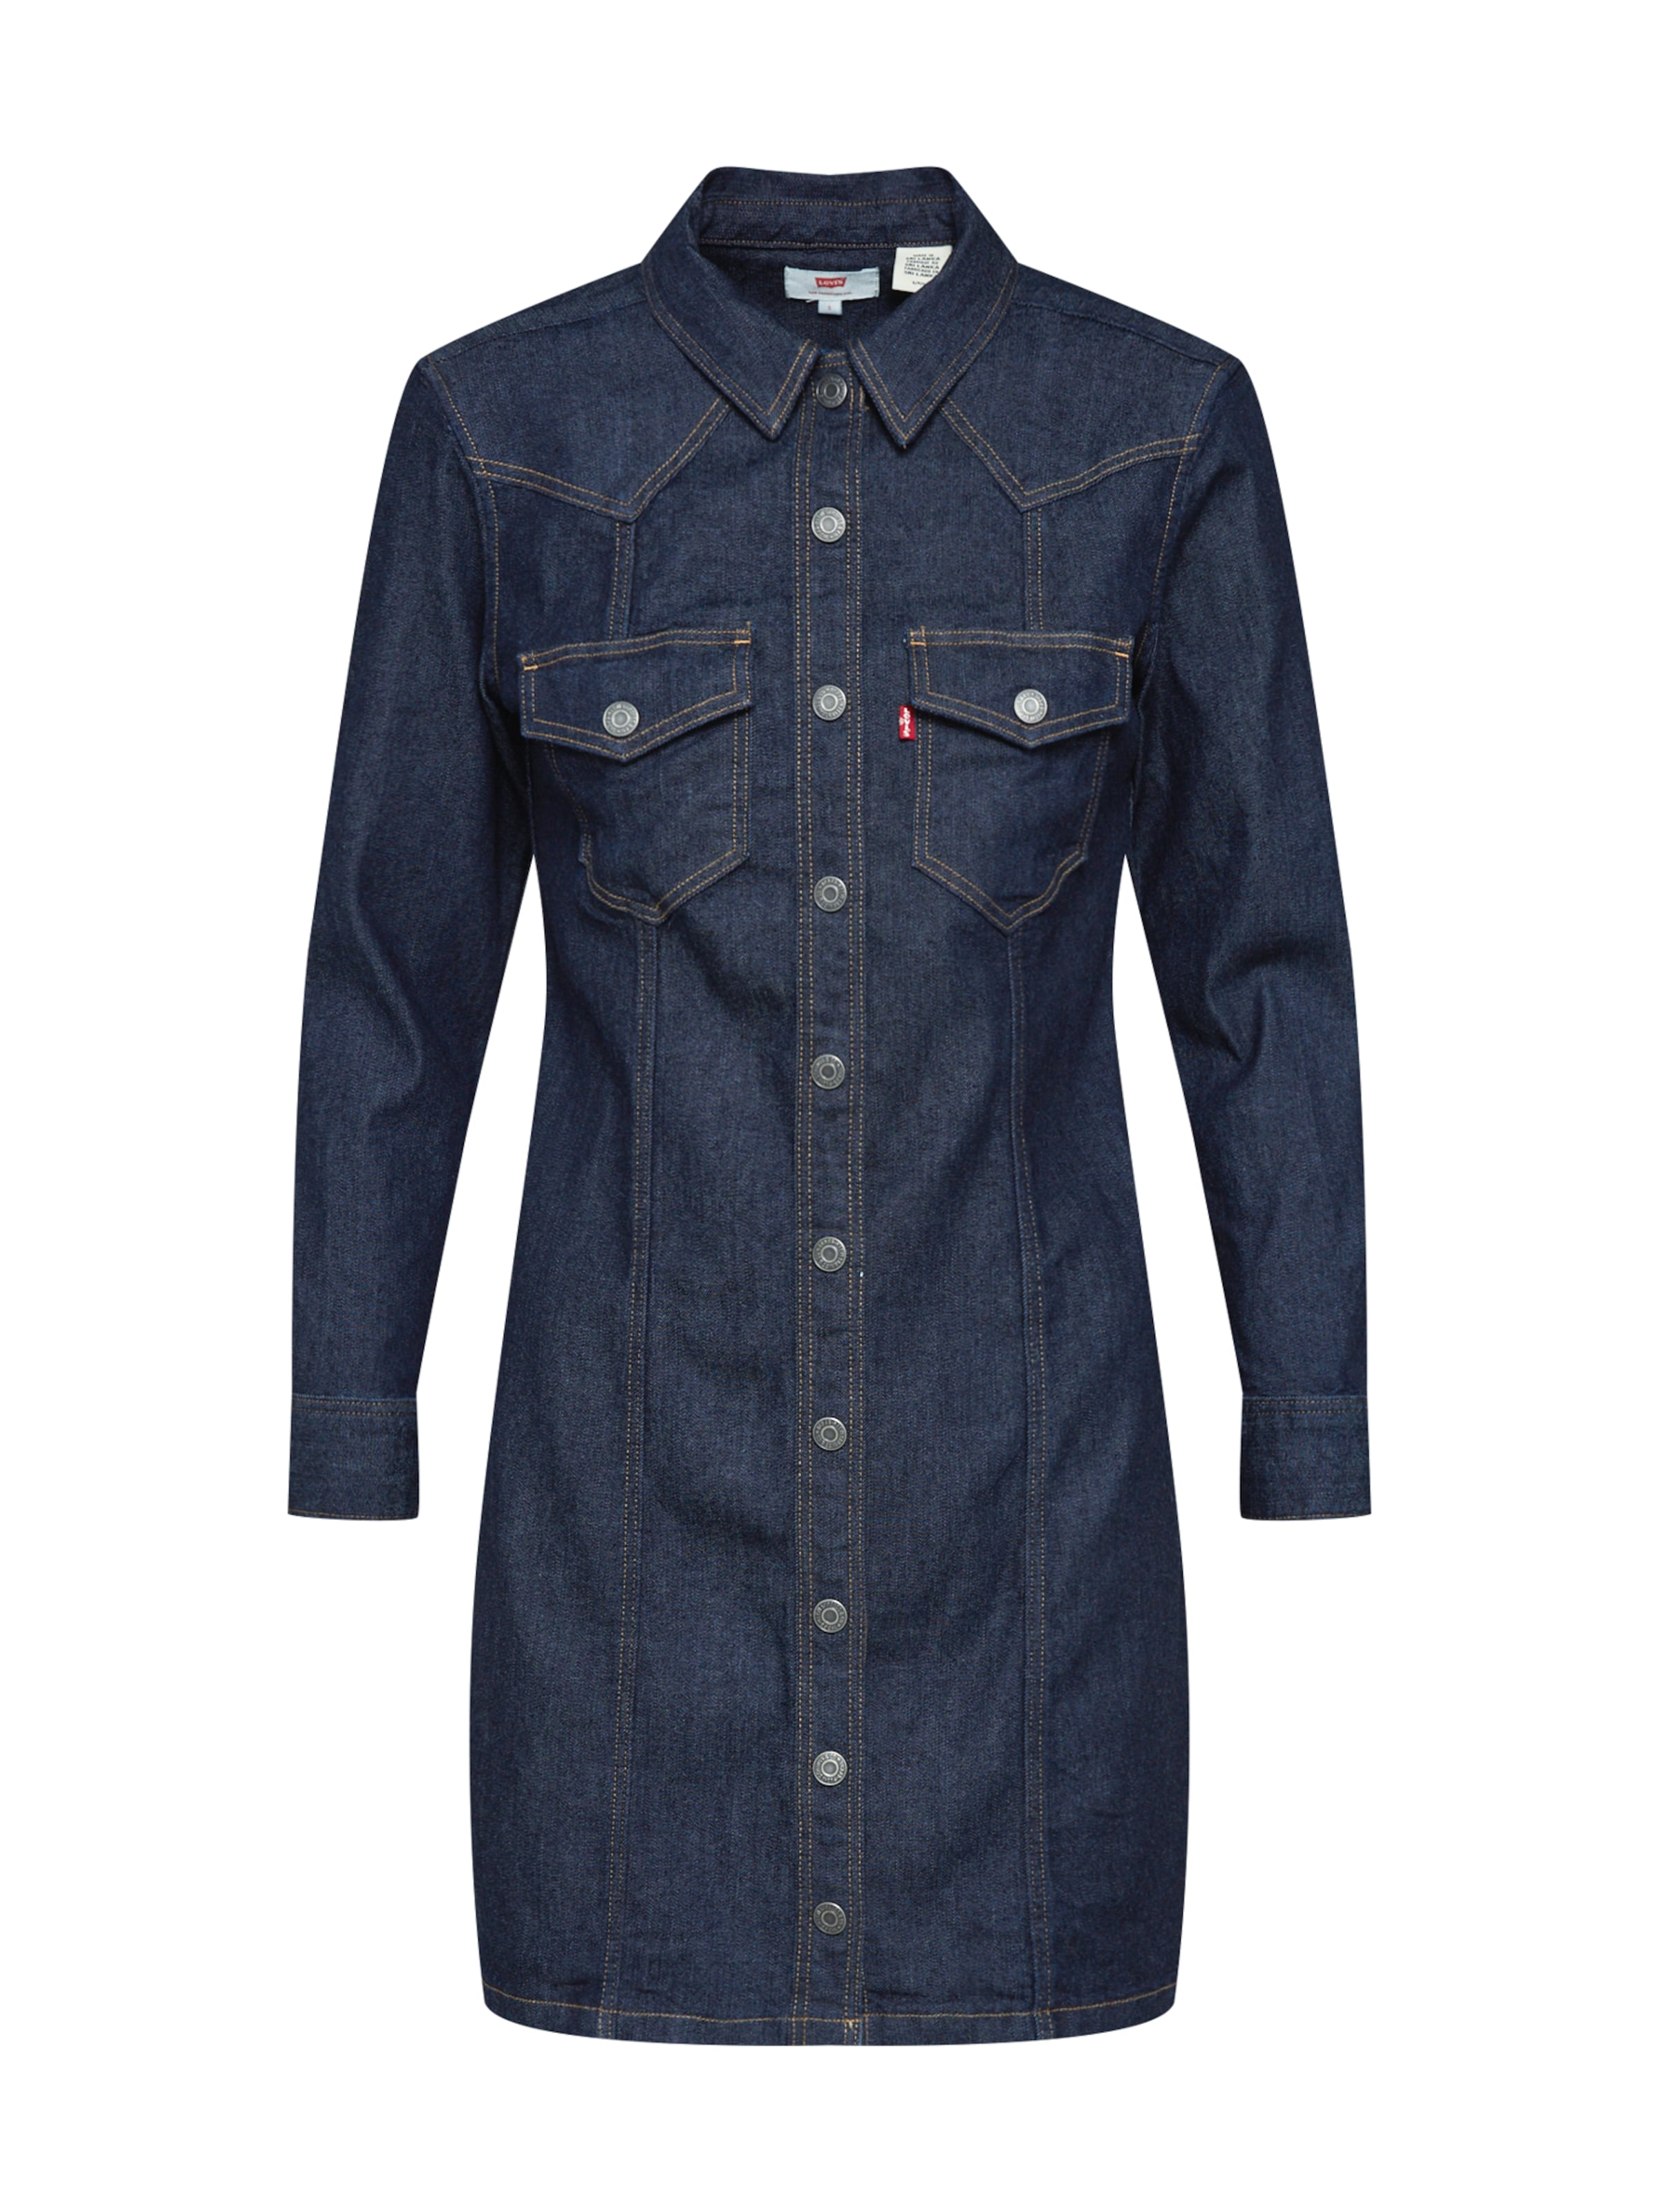 chemise Levi's Bleu En 'gia Western' Denim Robe zLpqGSVUM